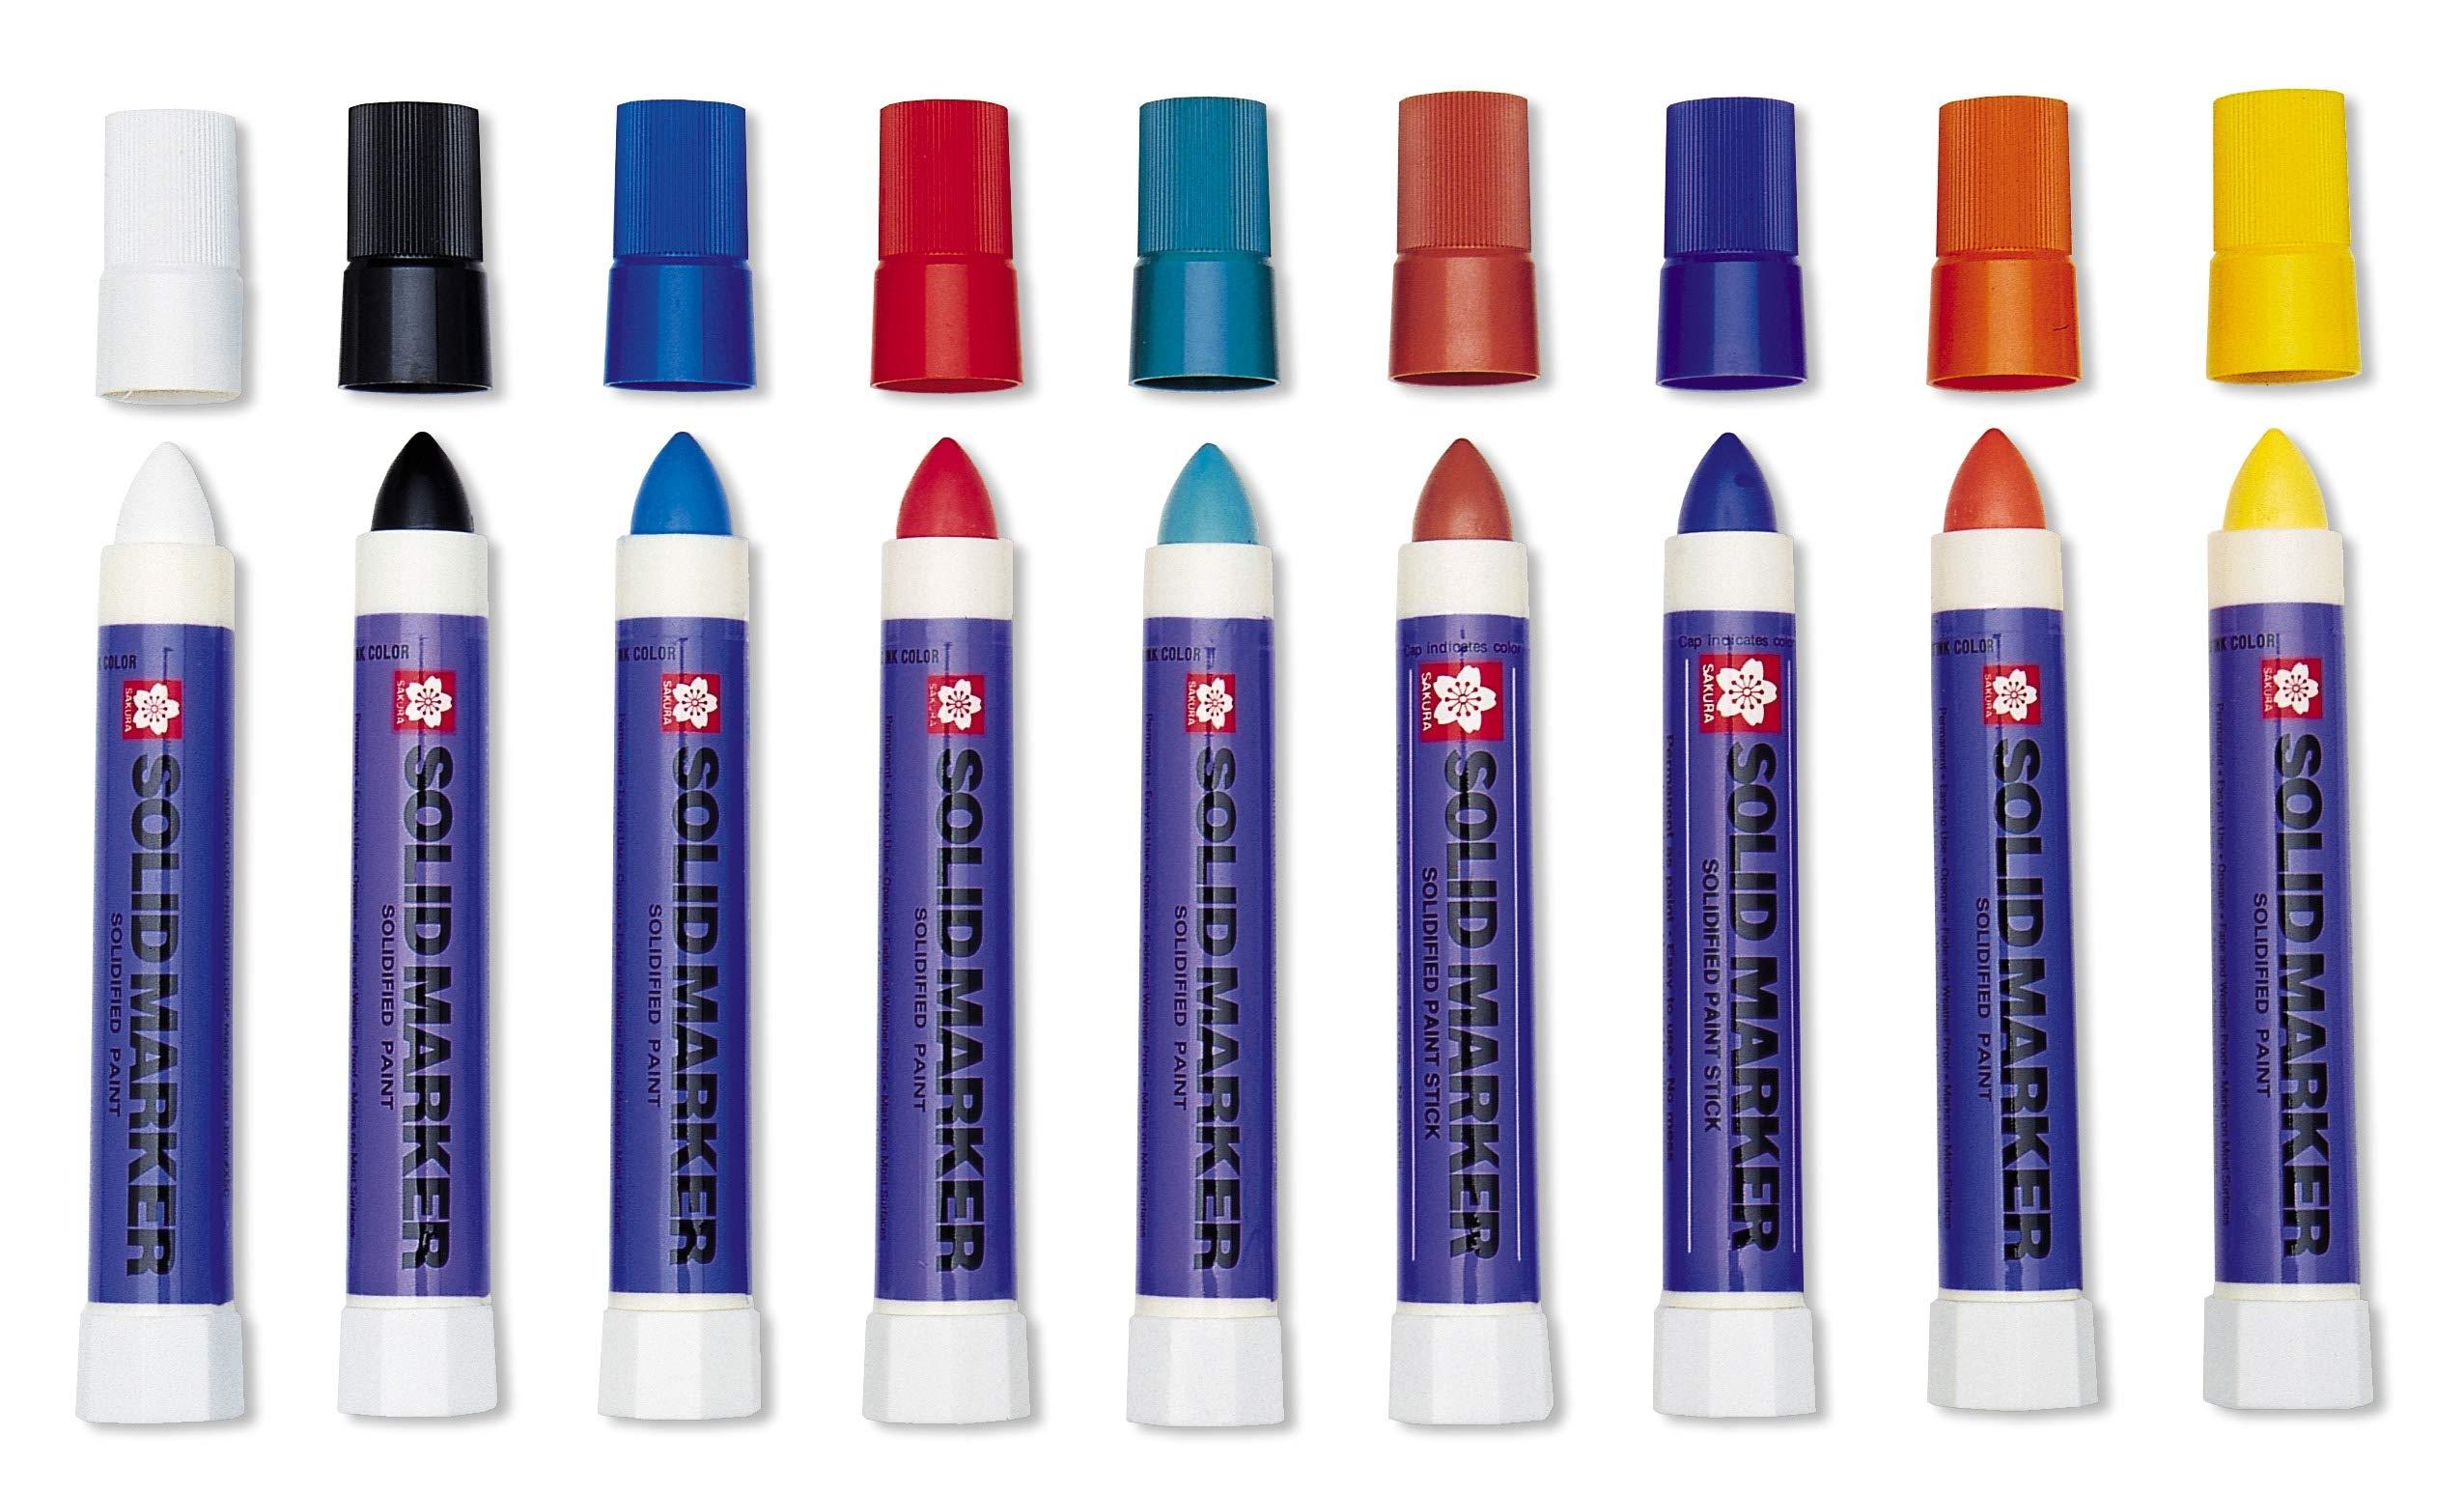 12 Assorted Colors Sakura Paint Marker Set